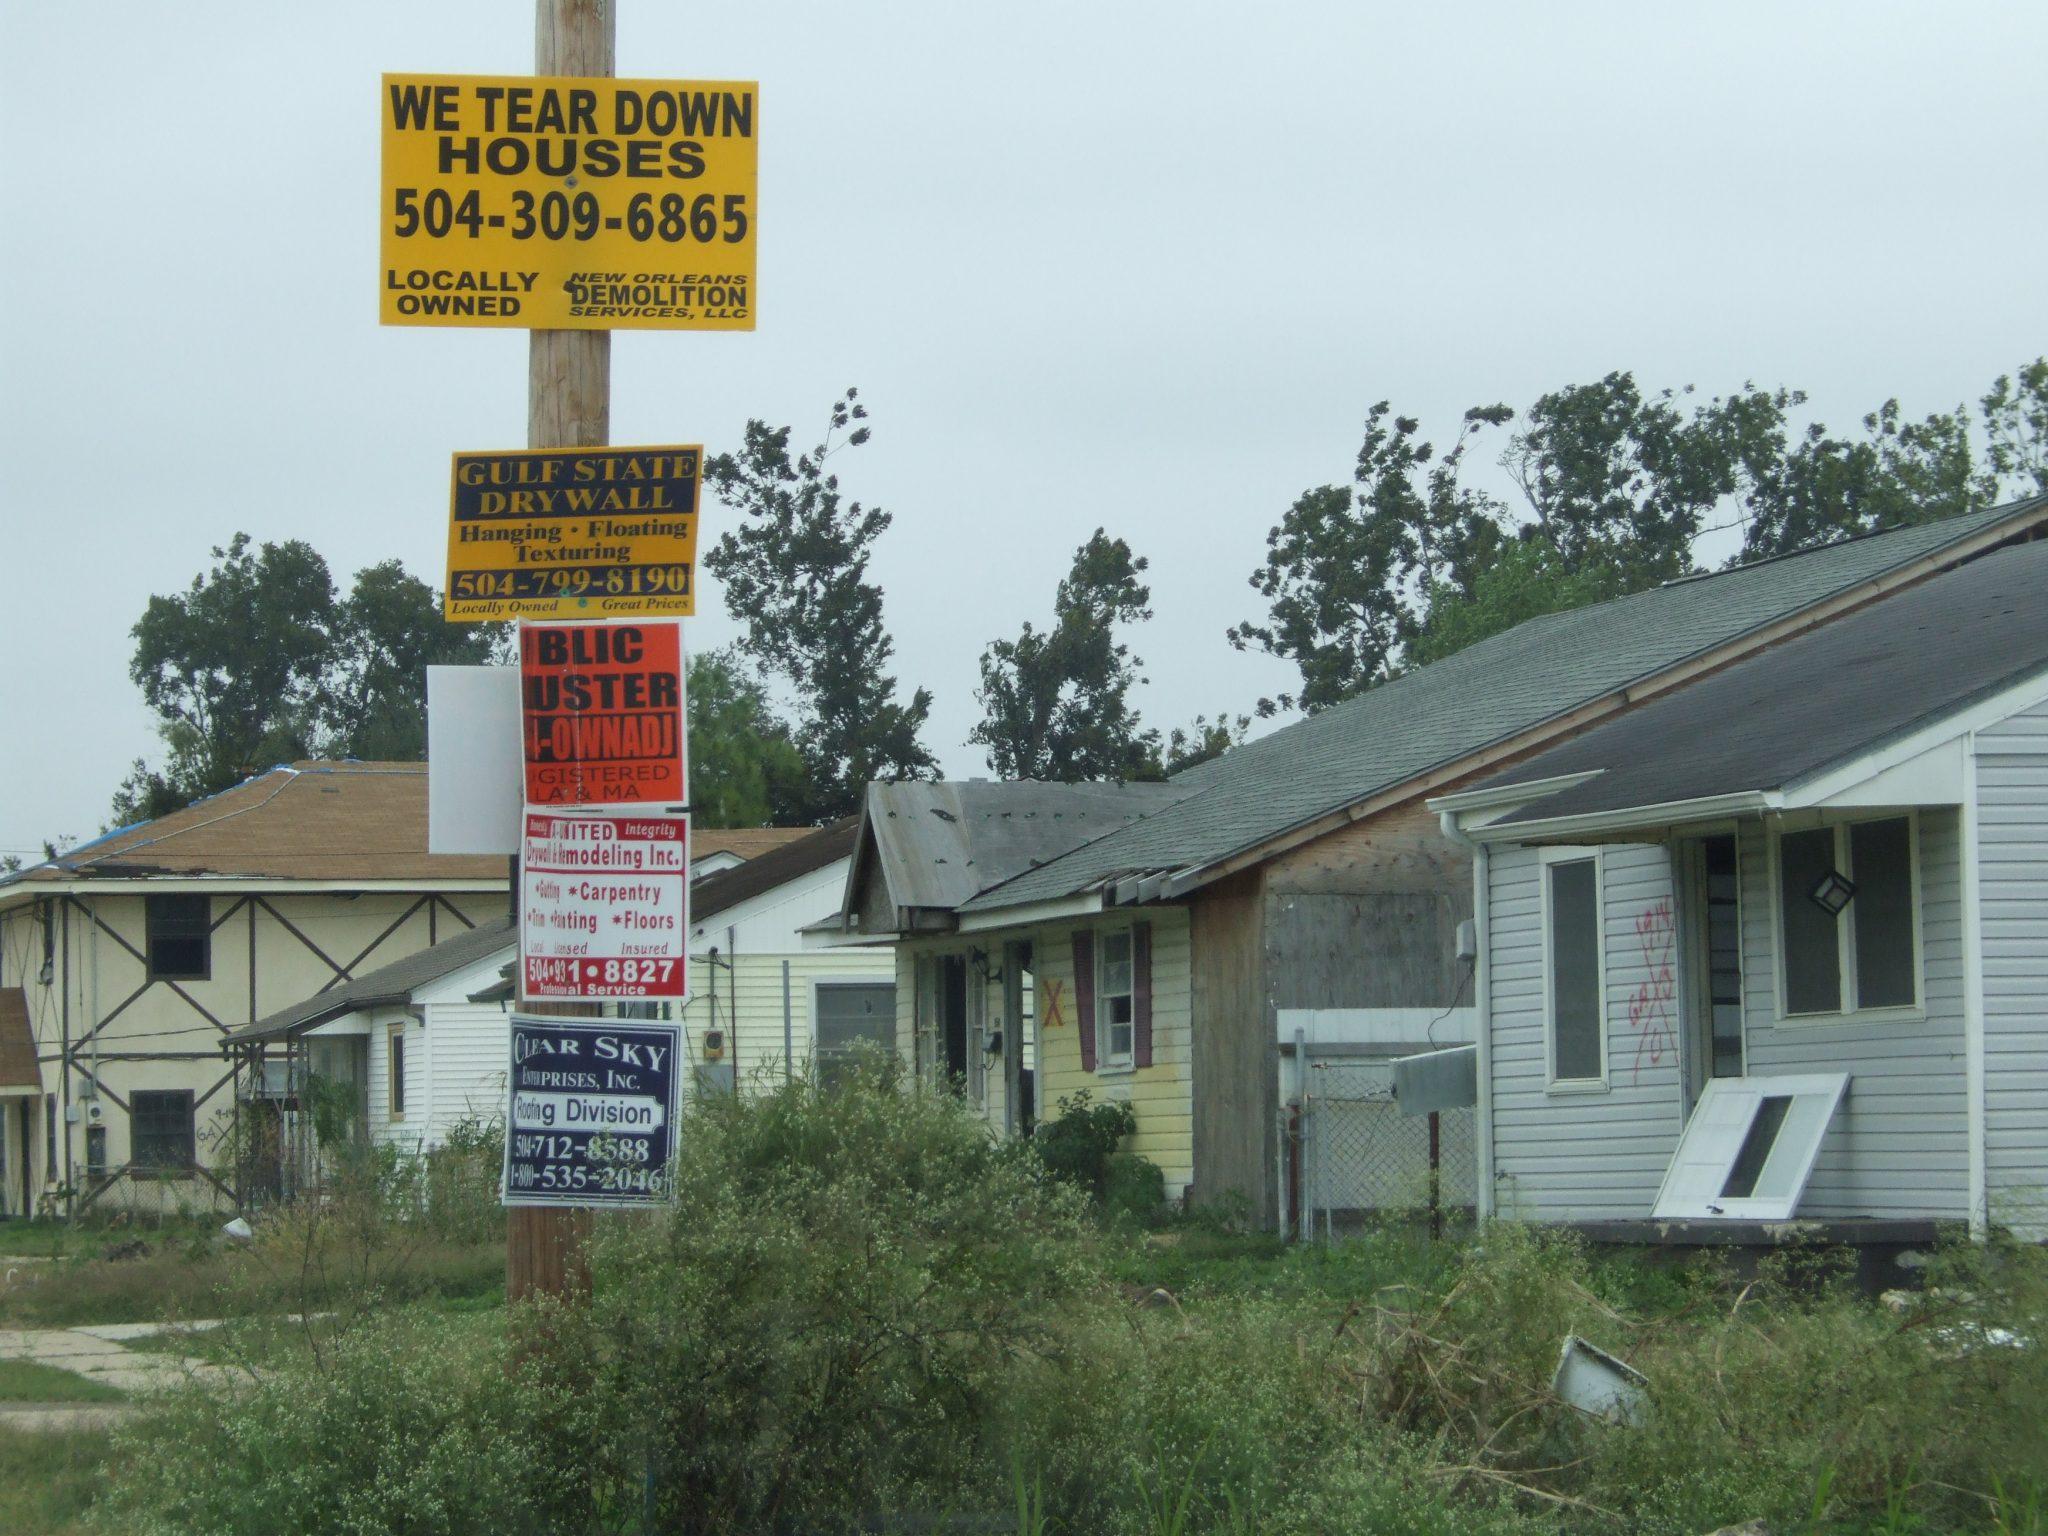 New Orleans Katrina damage